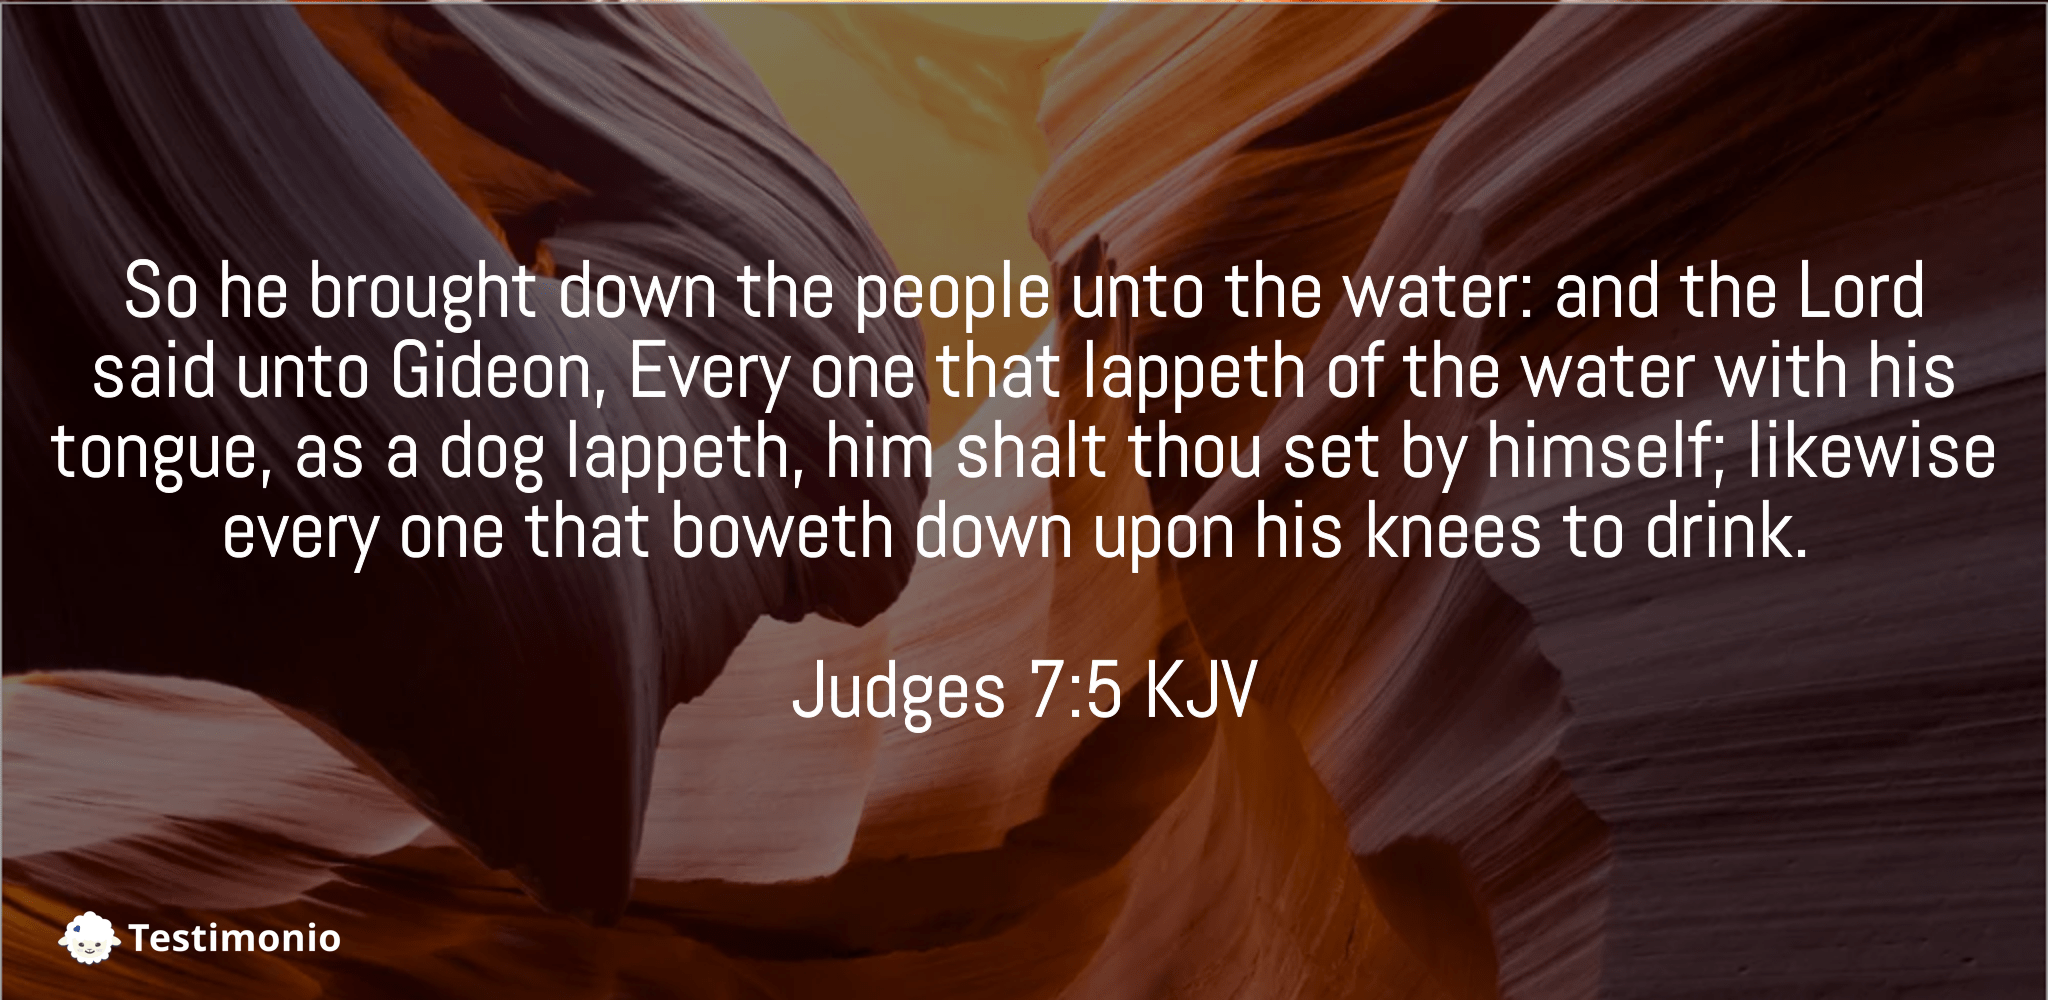 Judges 7:5